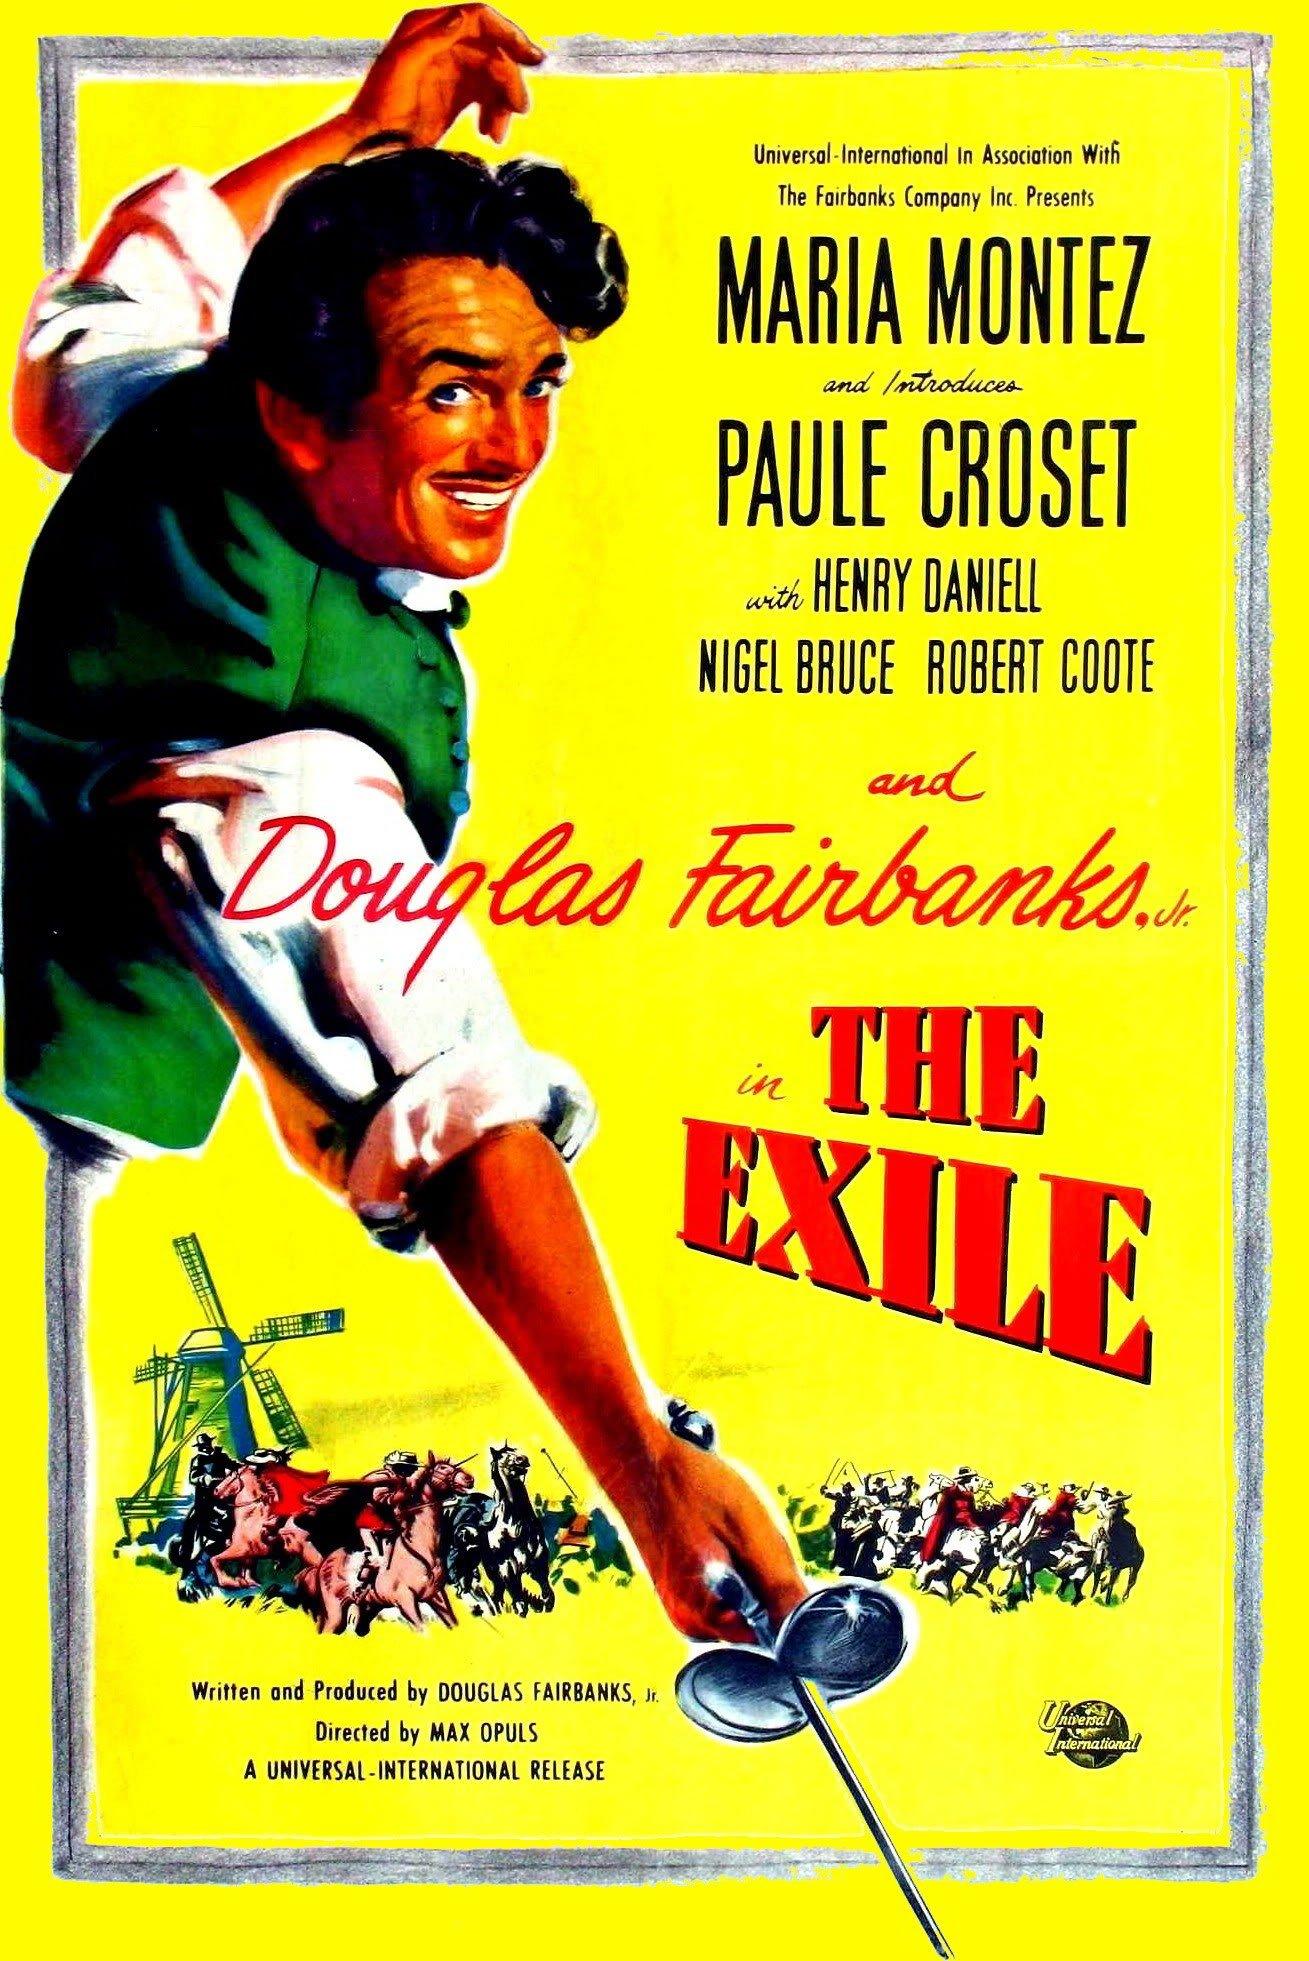 Douglas Fairbanks Jr. in The Exile (1947)